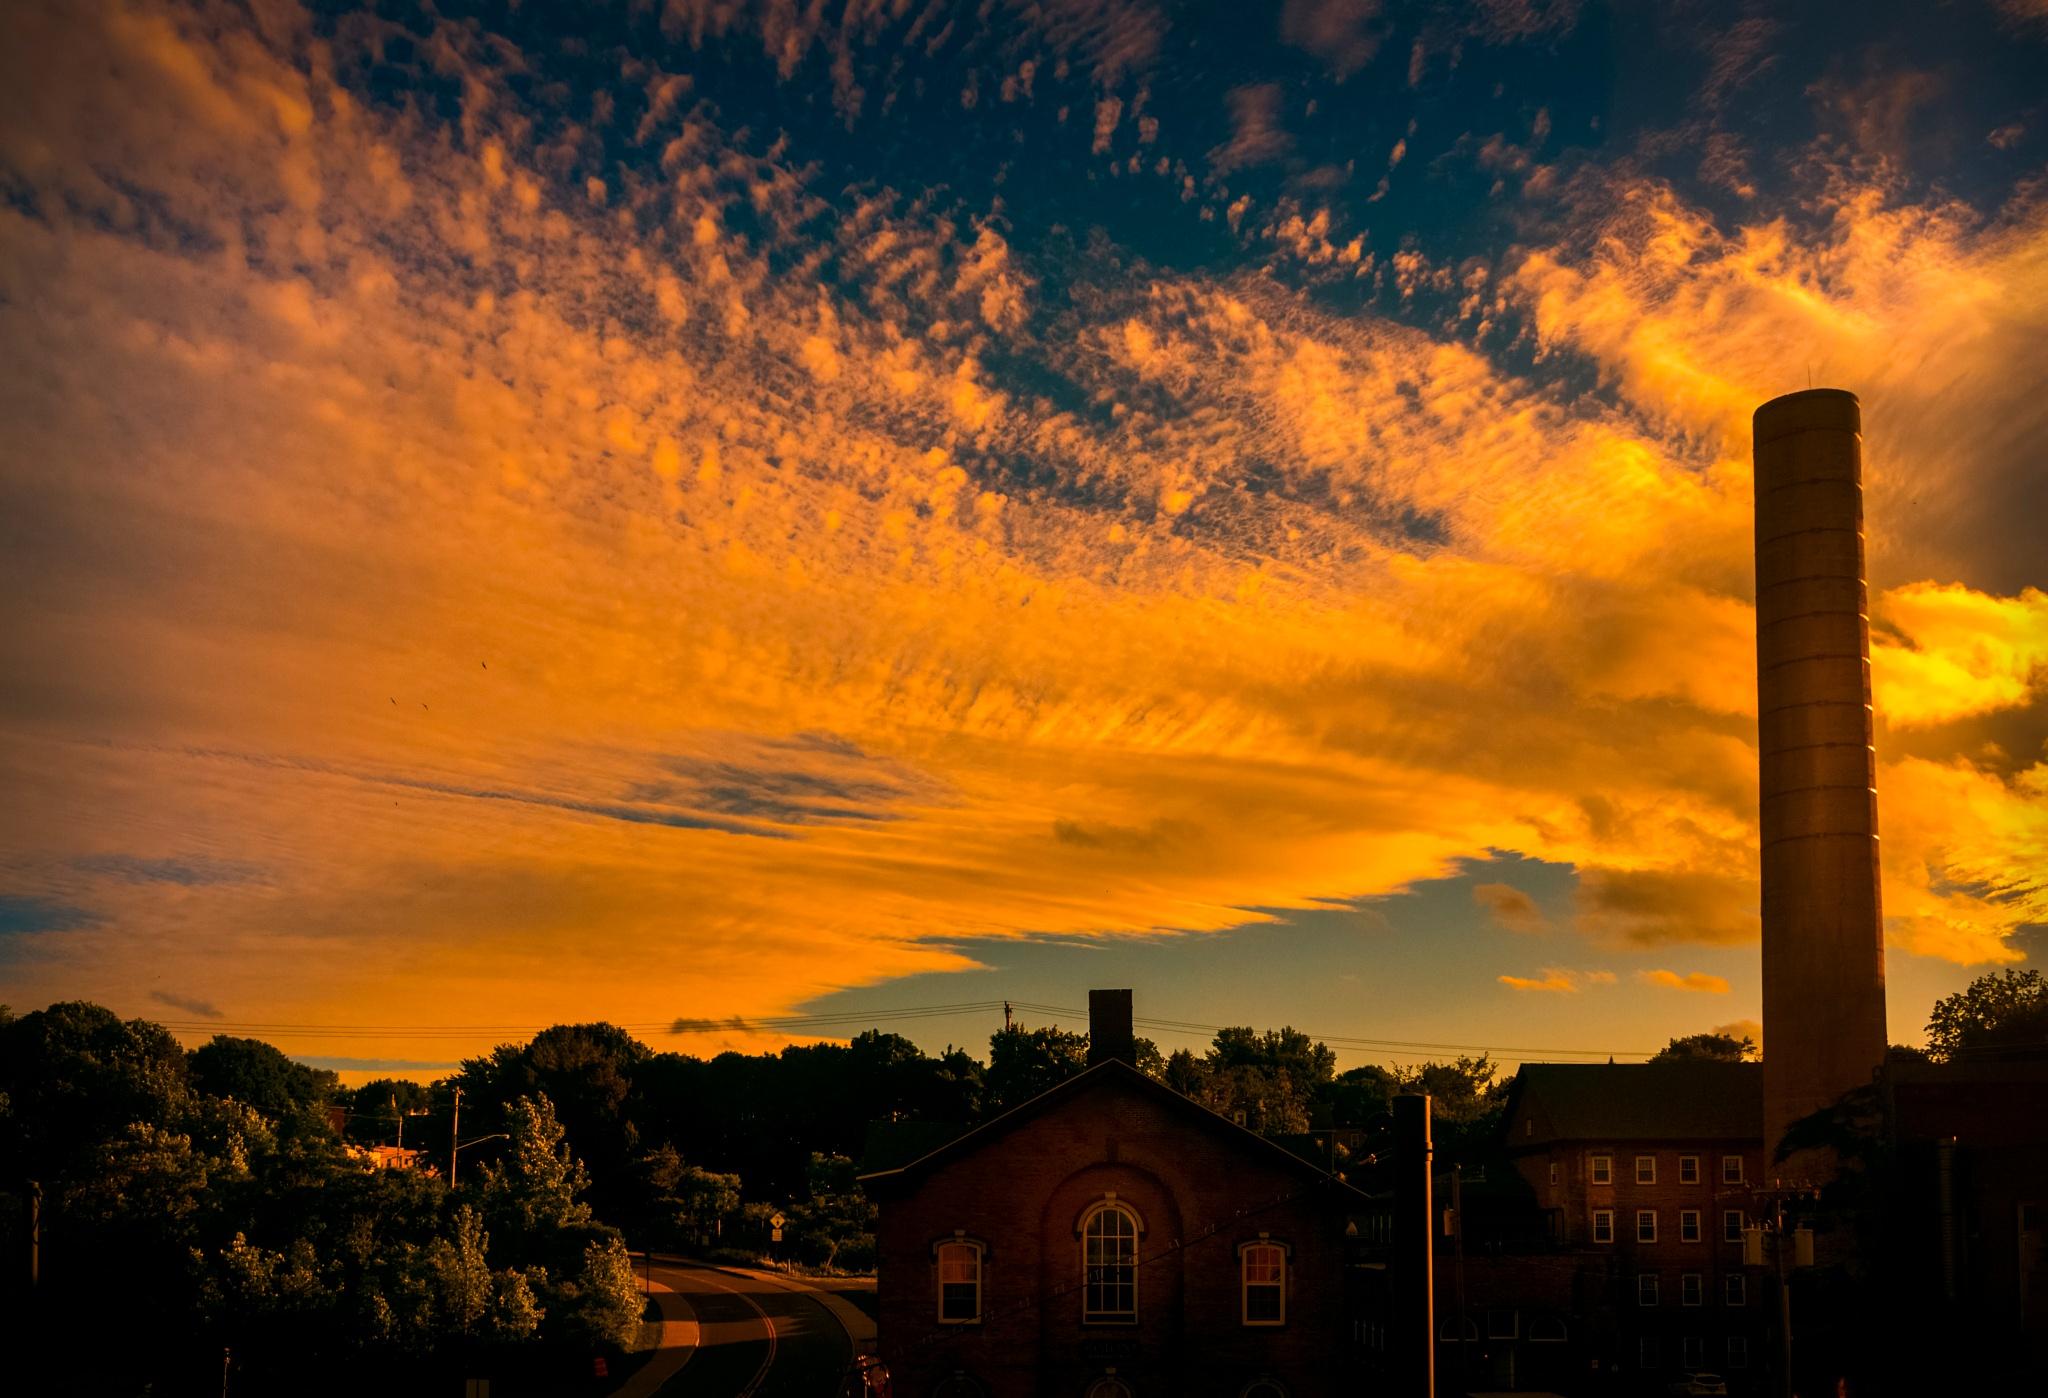 Sunset by ronsunphoto